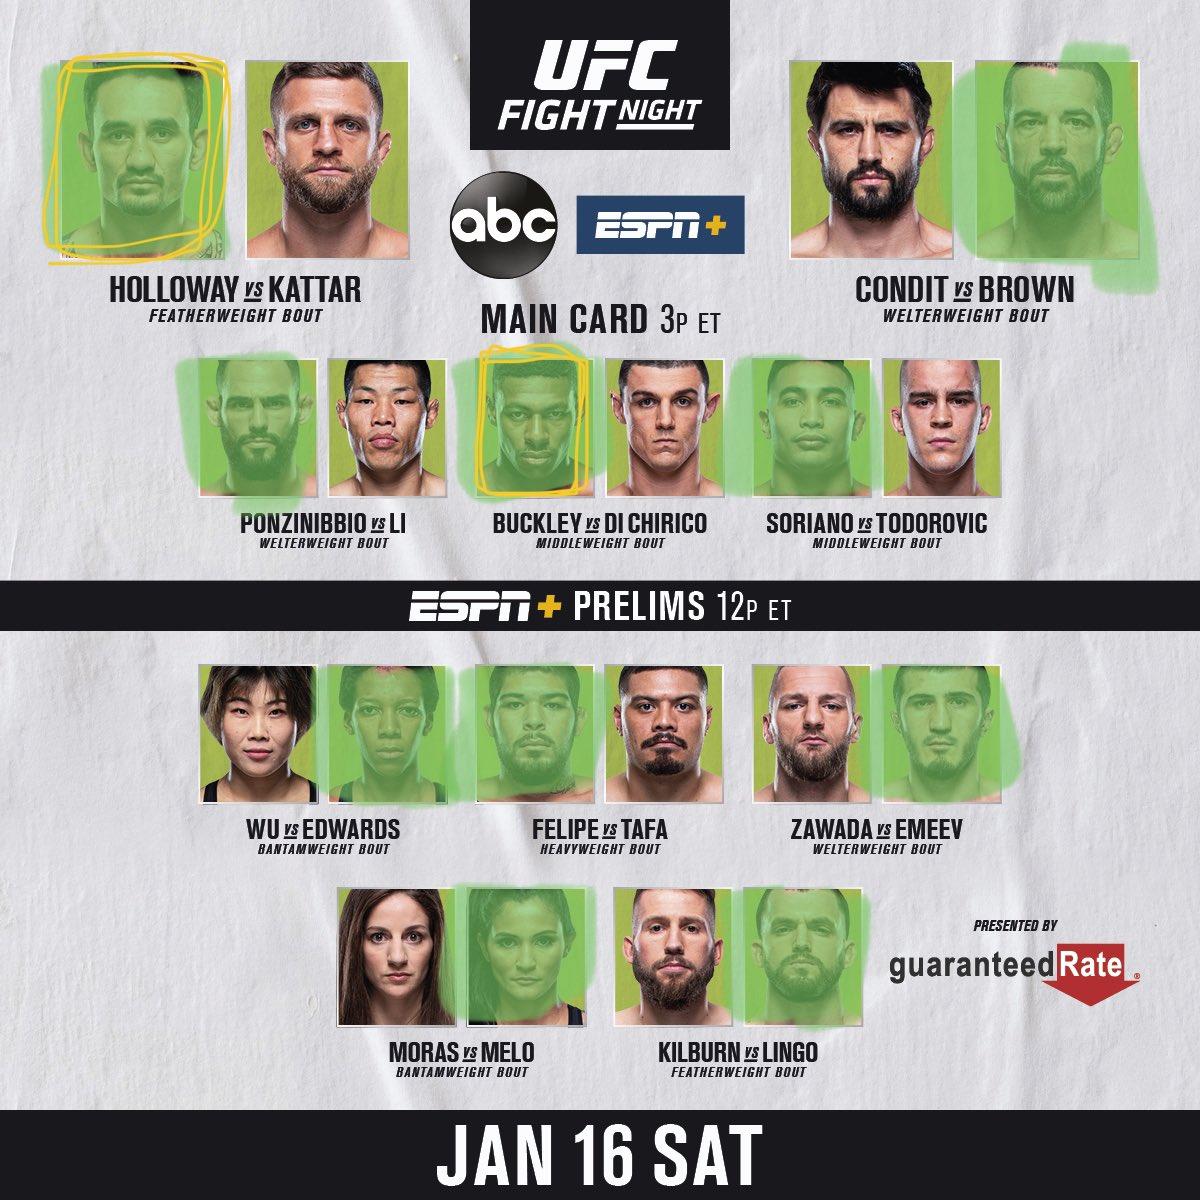 My picks! #UFCFightIsland7 #ufc @ConsensusScore @BlessedMMA @Newmansa94